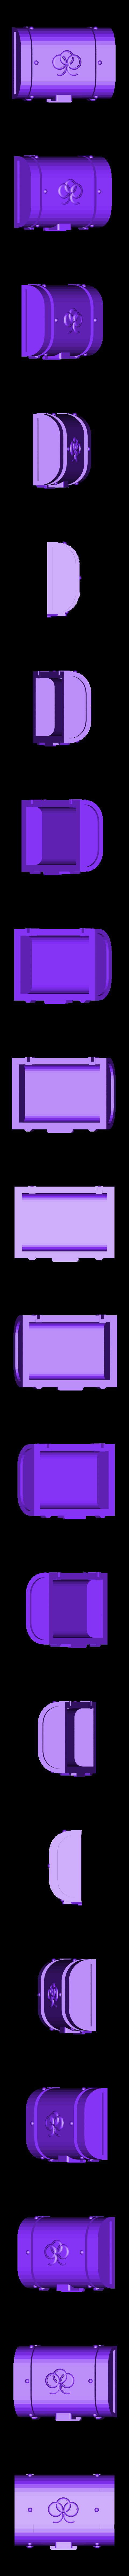 PiratesboxTop.stl Download free STL file Pirates Chest • 3D printable model, Slagerqod